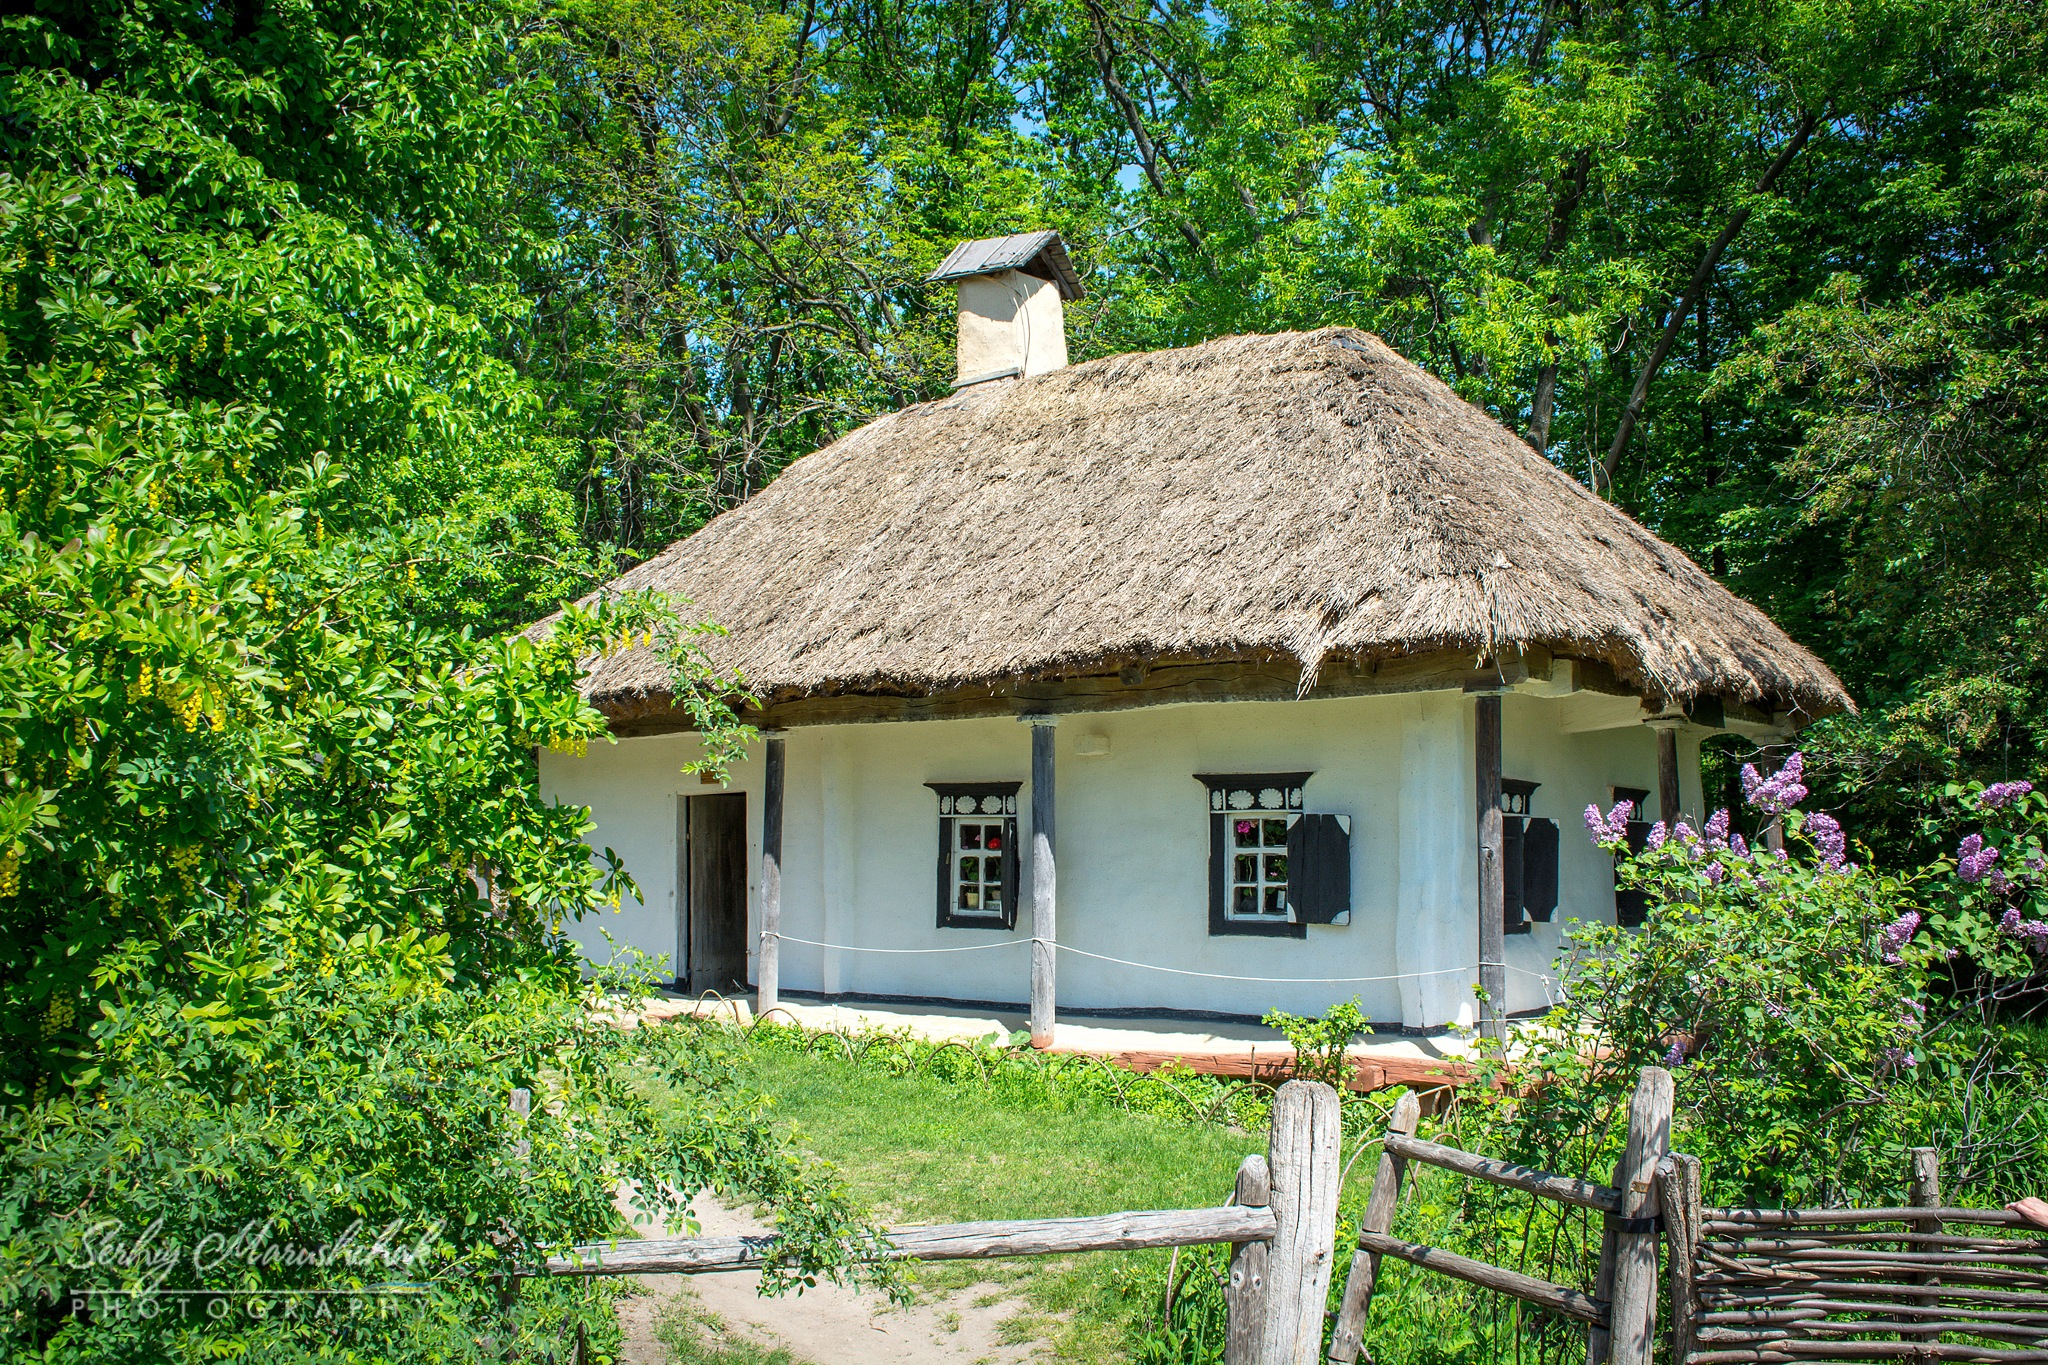 Весняна хатка... / Ukrainian hut in spring... by artmars07